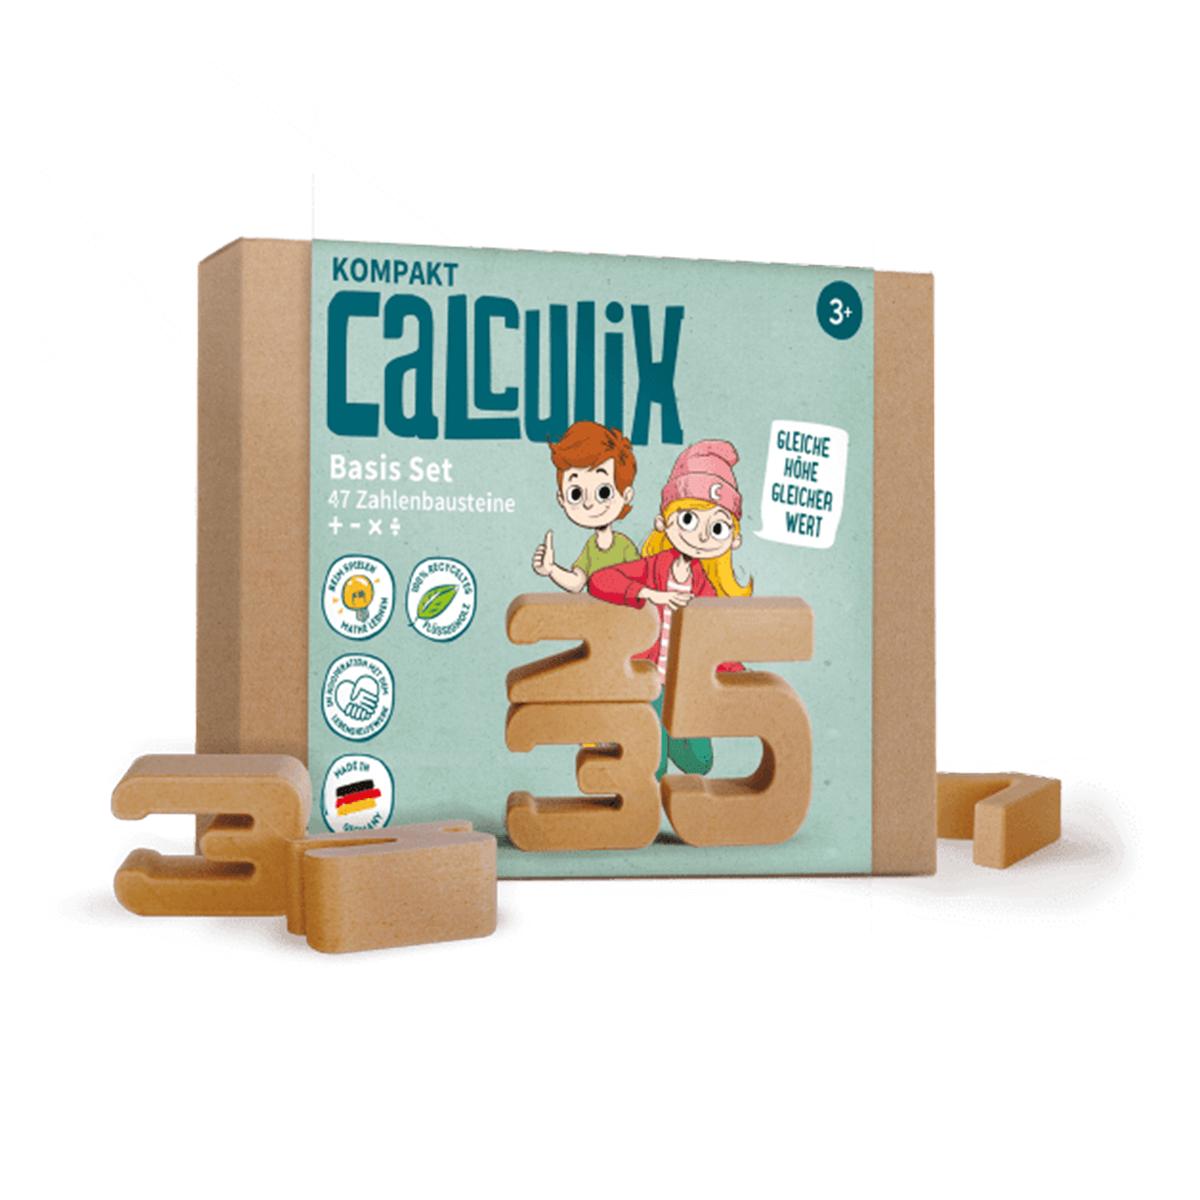 Calculix little big things GmbH